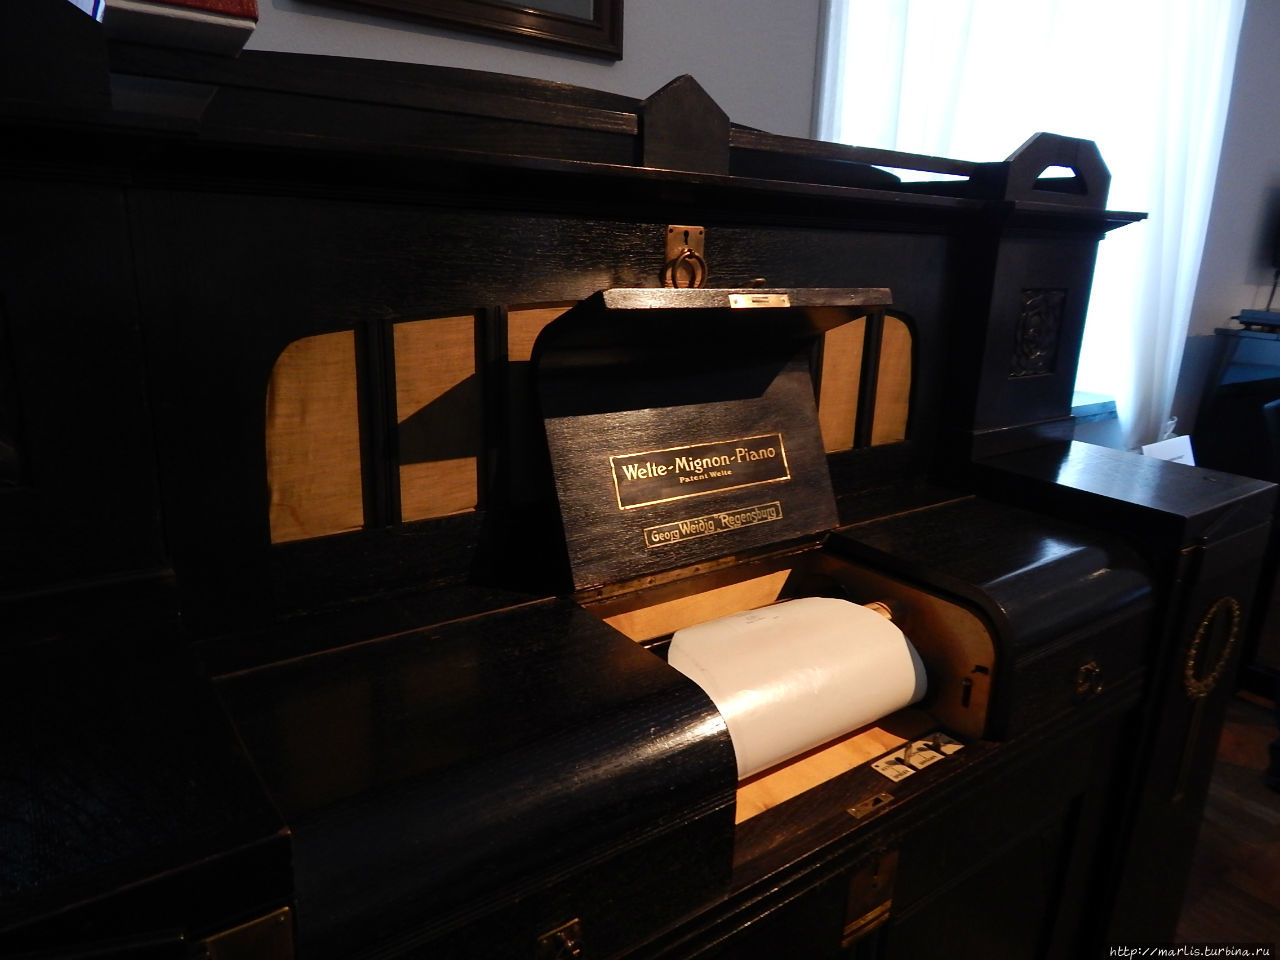 Брухзаль. Музей музыкальных автоматов Брухзаль, Германия